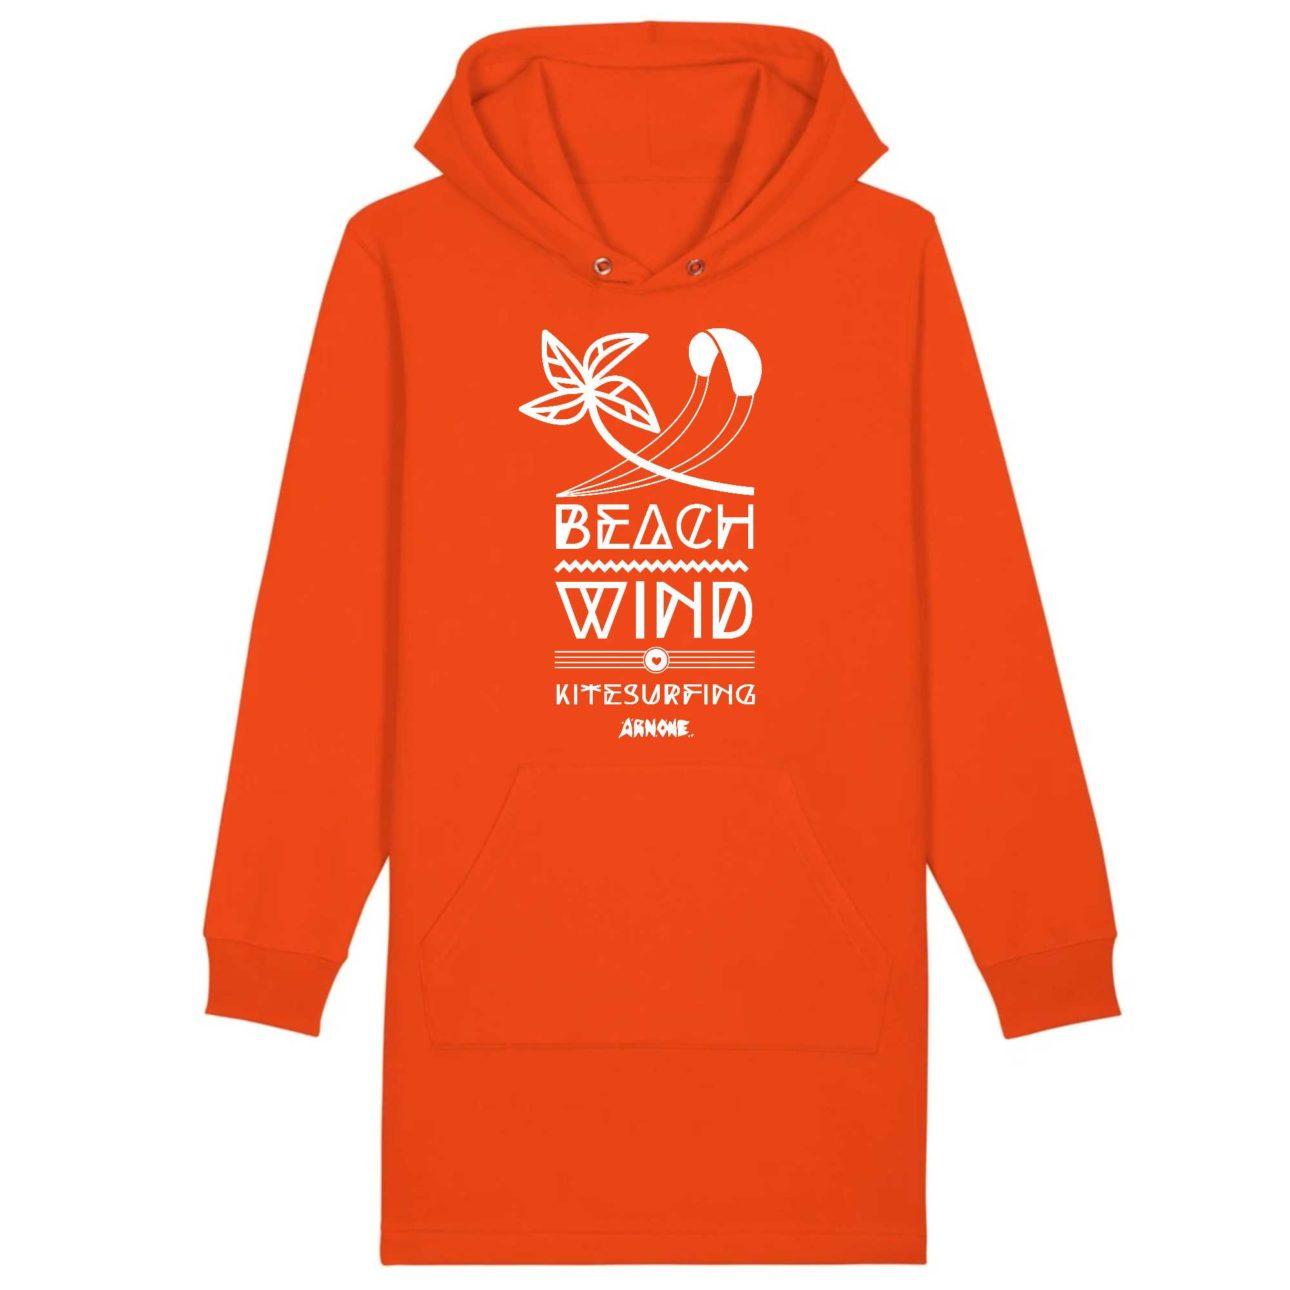 Wind Beach Kitesurfing